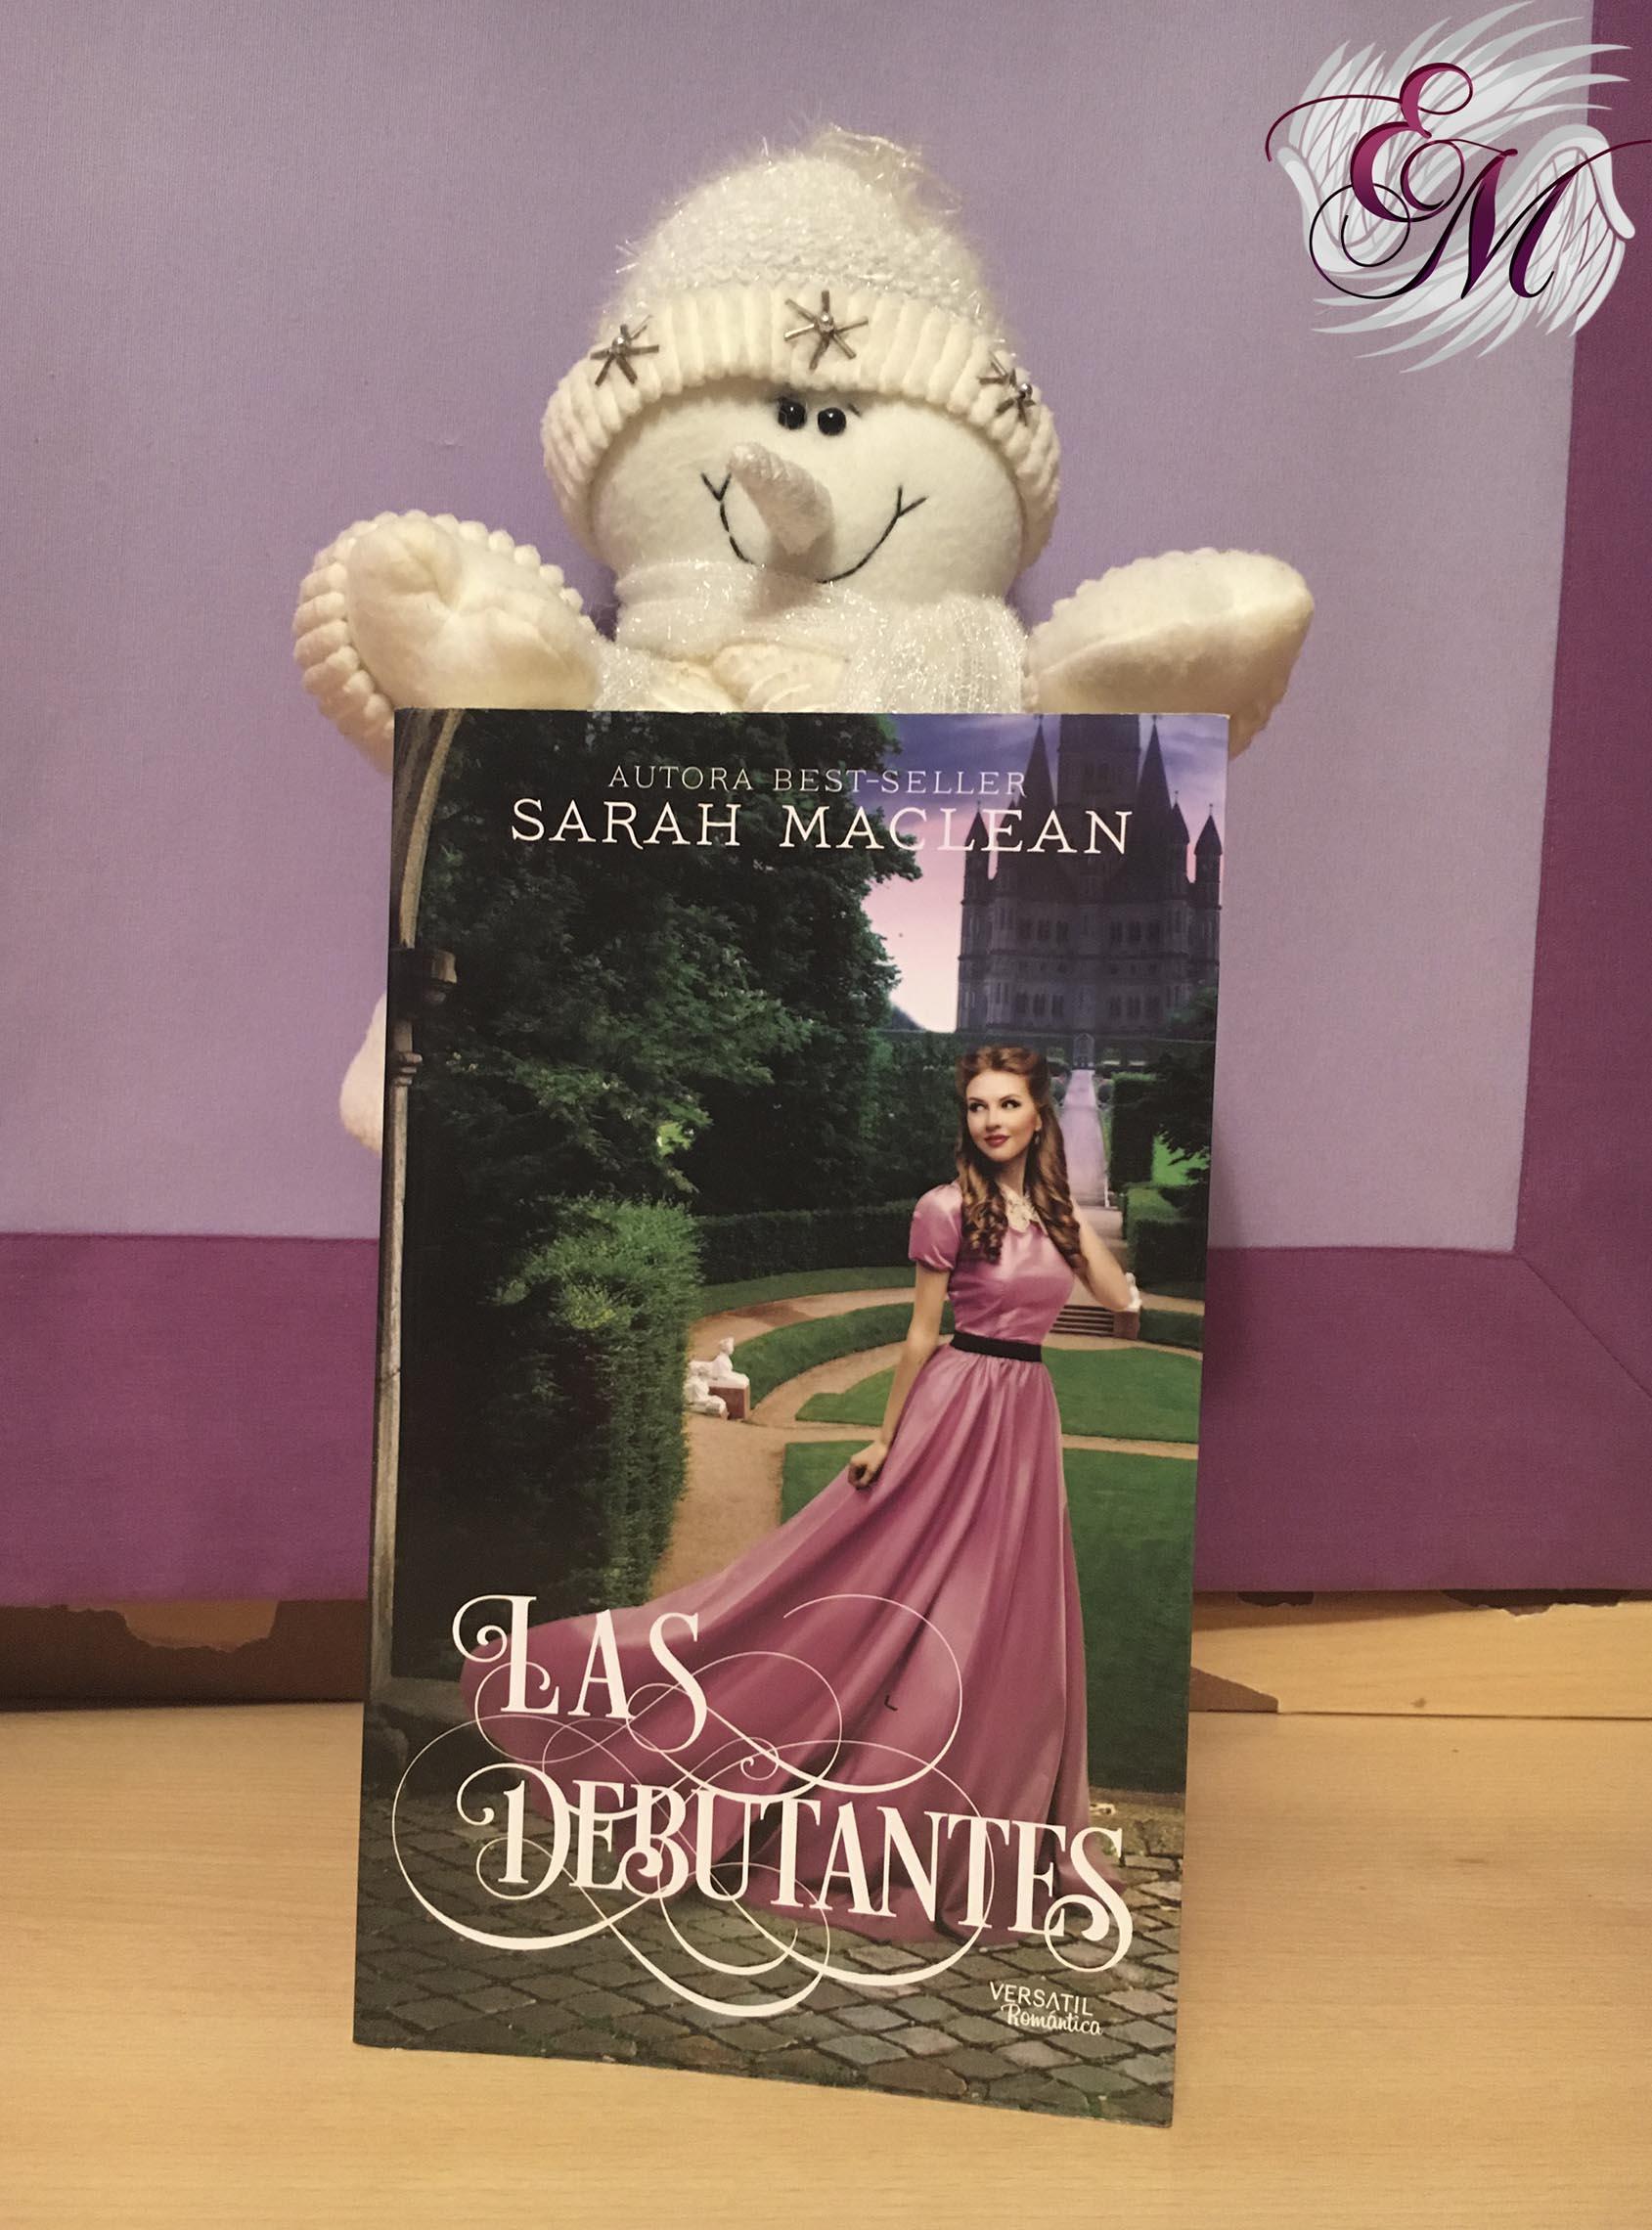 Las debutantes, de Sarah MacLean - Reseña